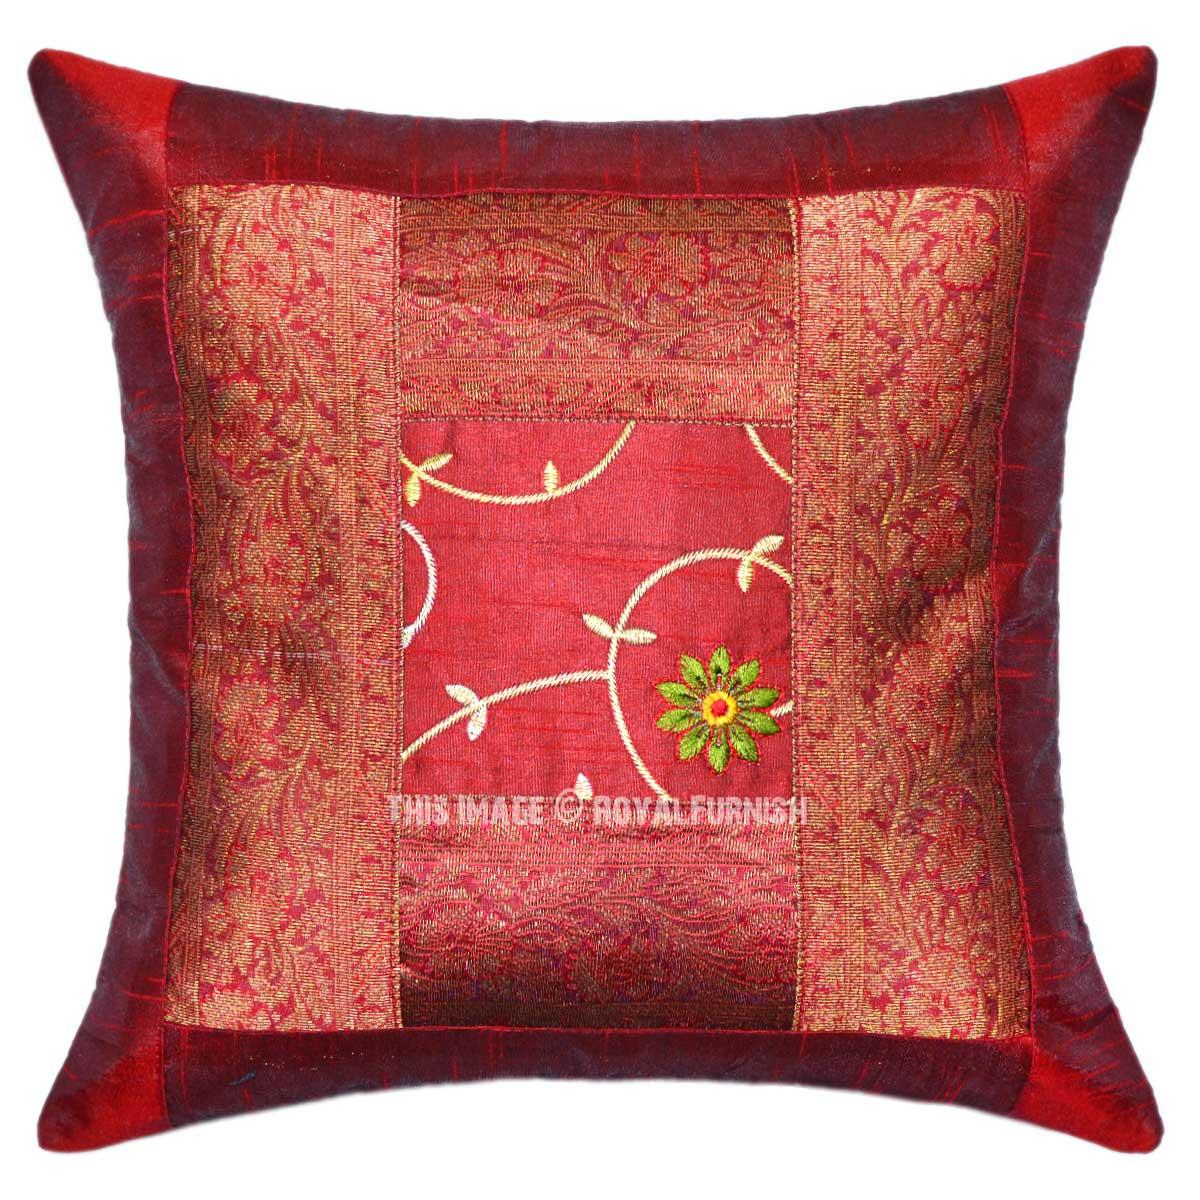 Burgundy Floral Throw Pillows : Burgundy Floral Embroidery Hand Work Silk Throw Pillow Case 16X16 - RoyalFurnish.com